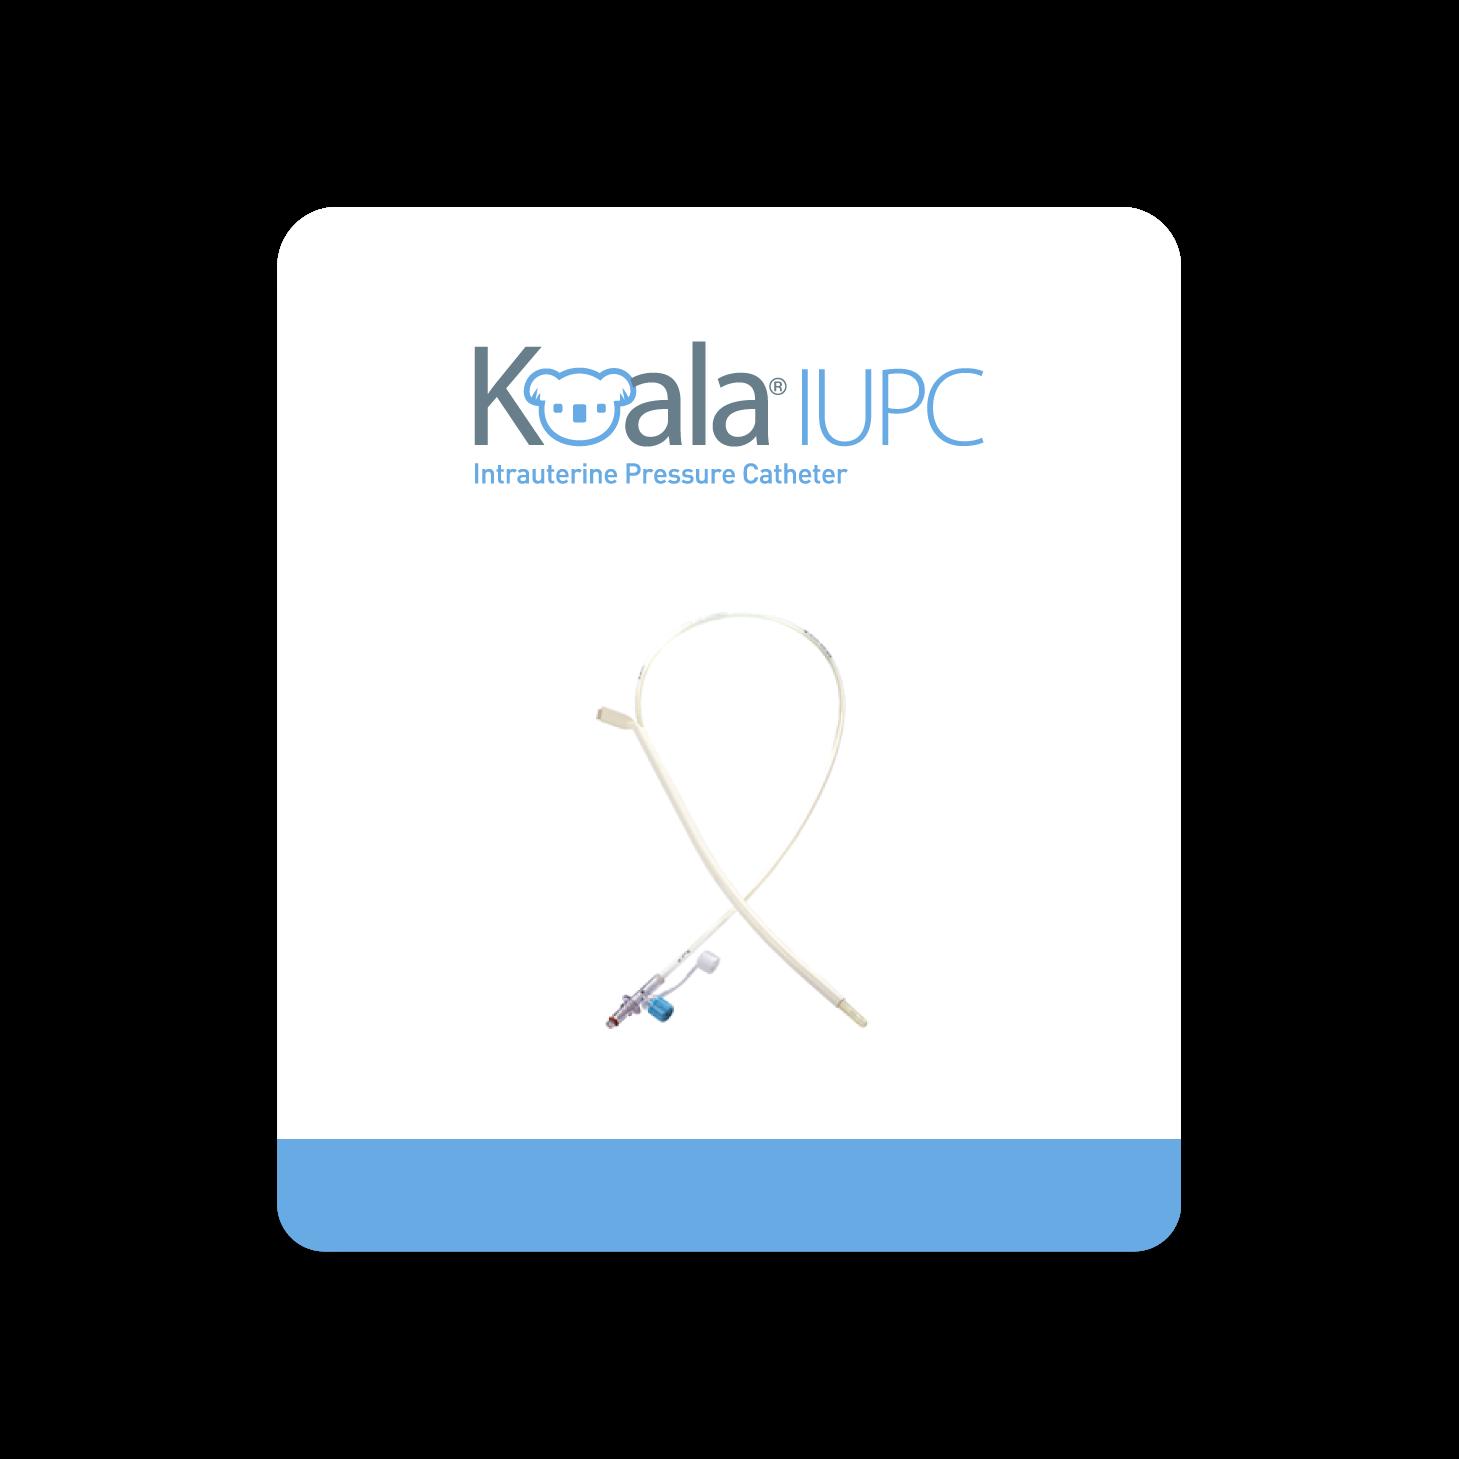 Koala Intrauterine Pressure Catheter Logo